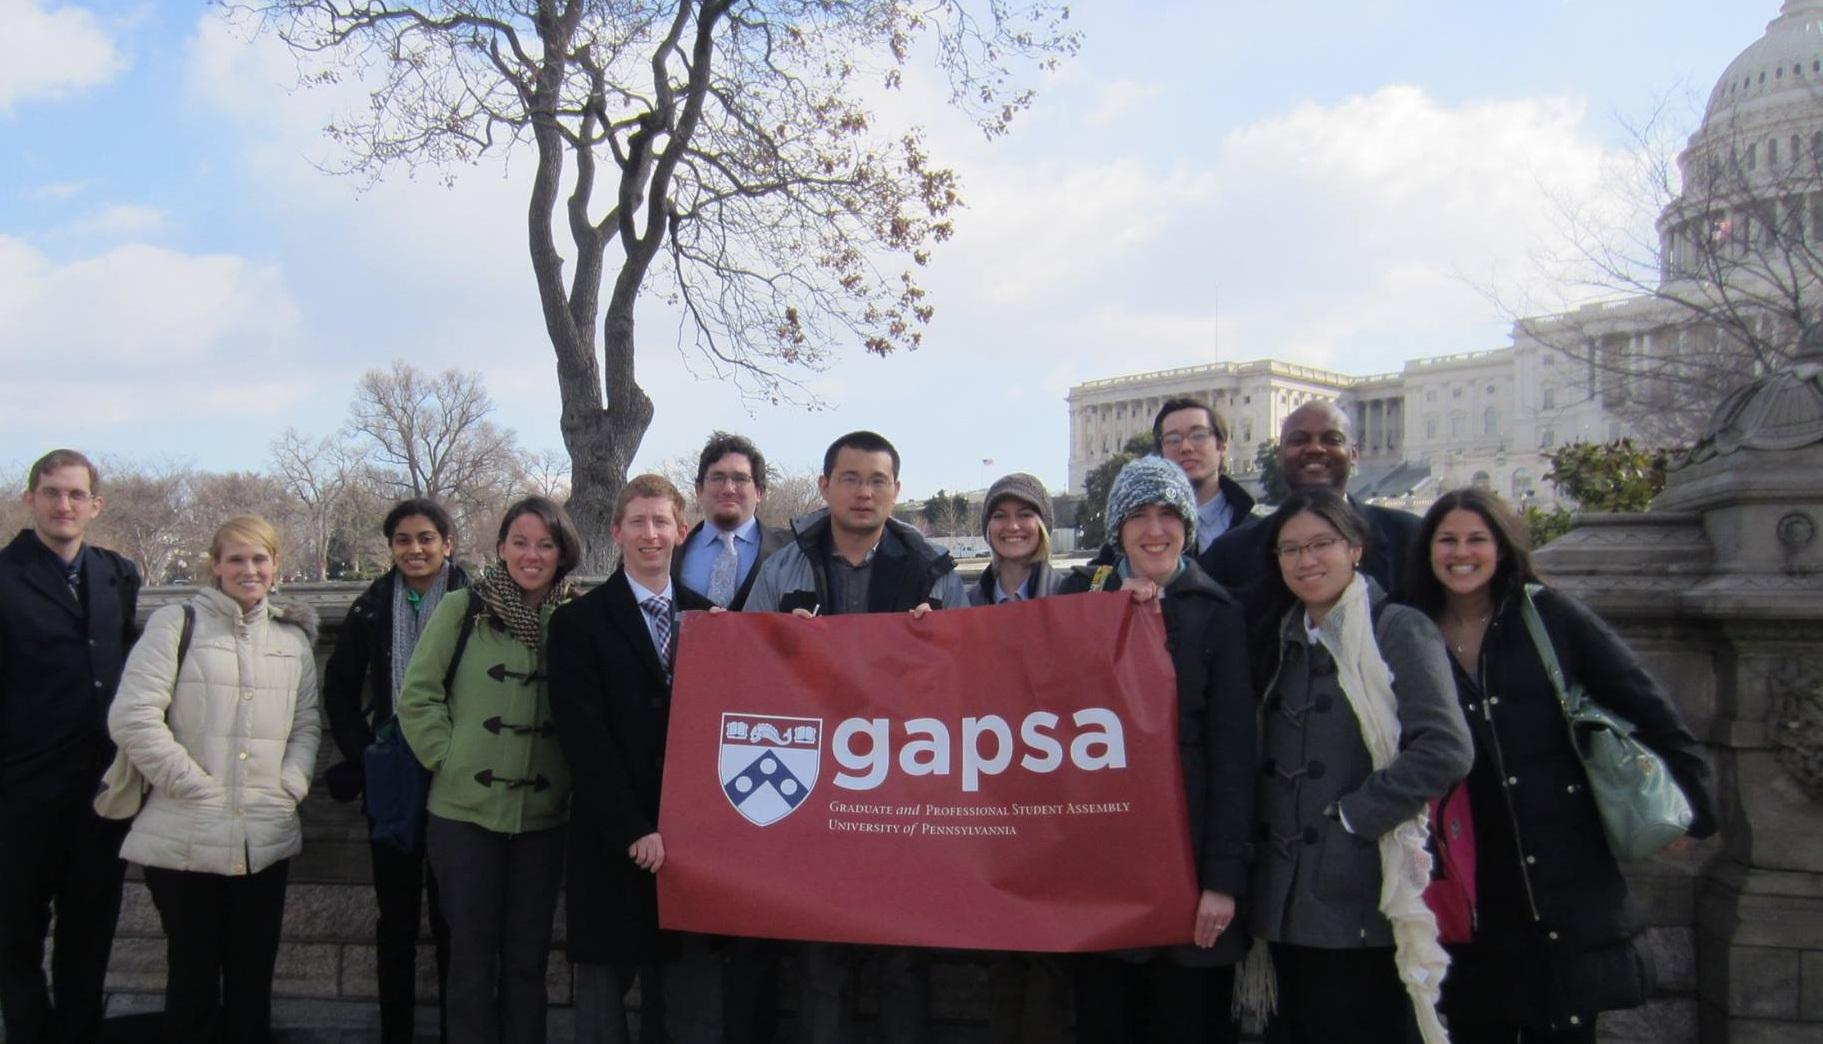 GAPSA-at-congress-2014.jpg